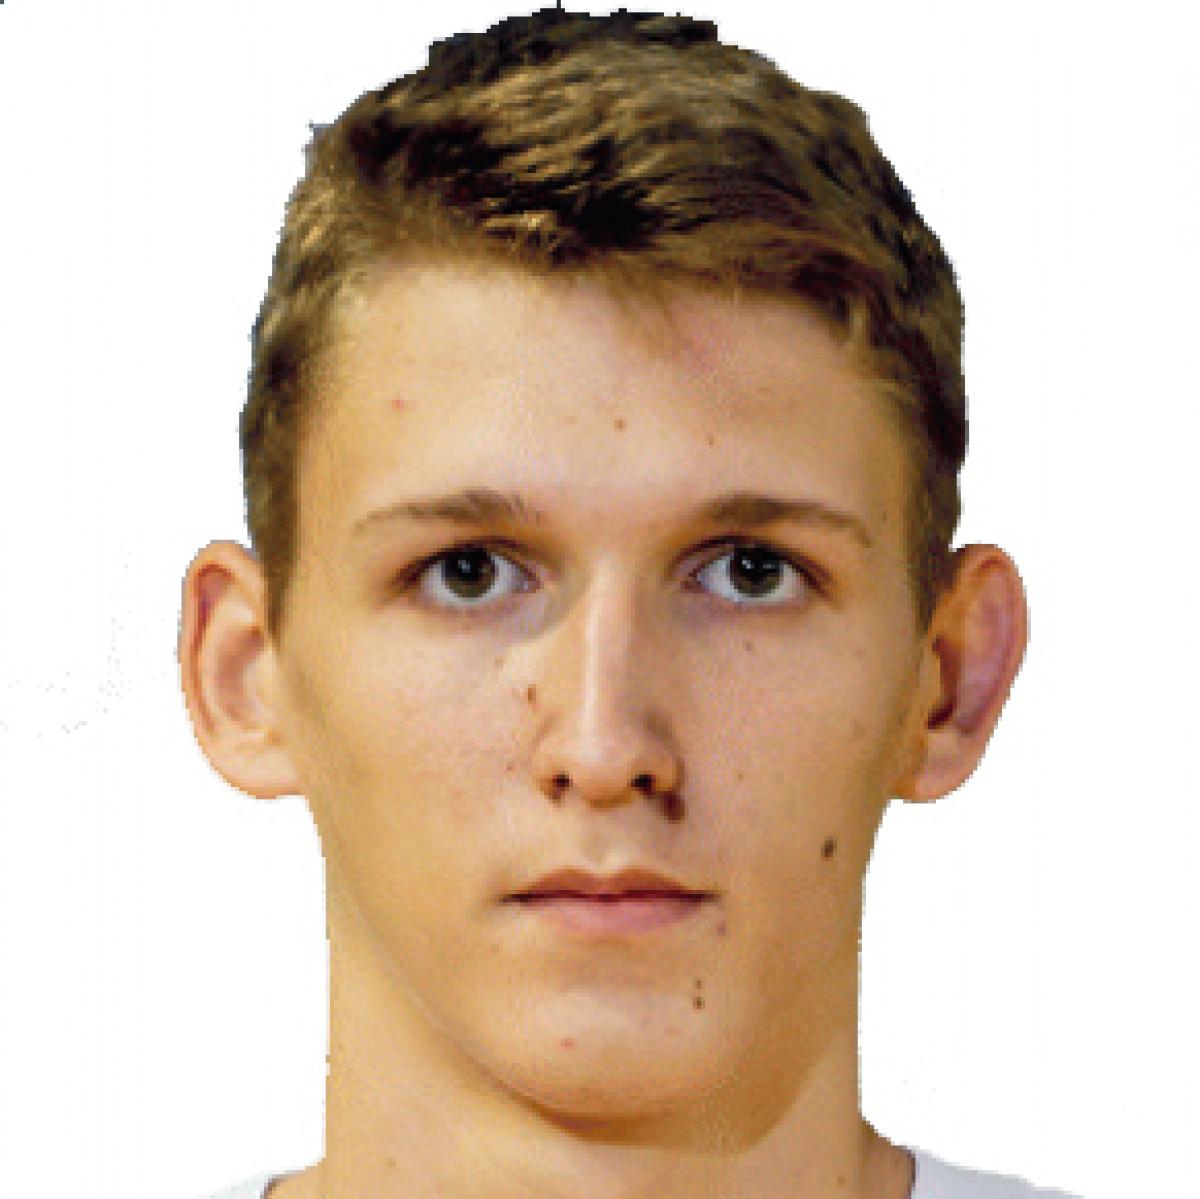 Luka Milicevic